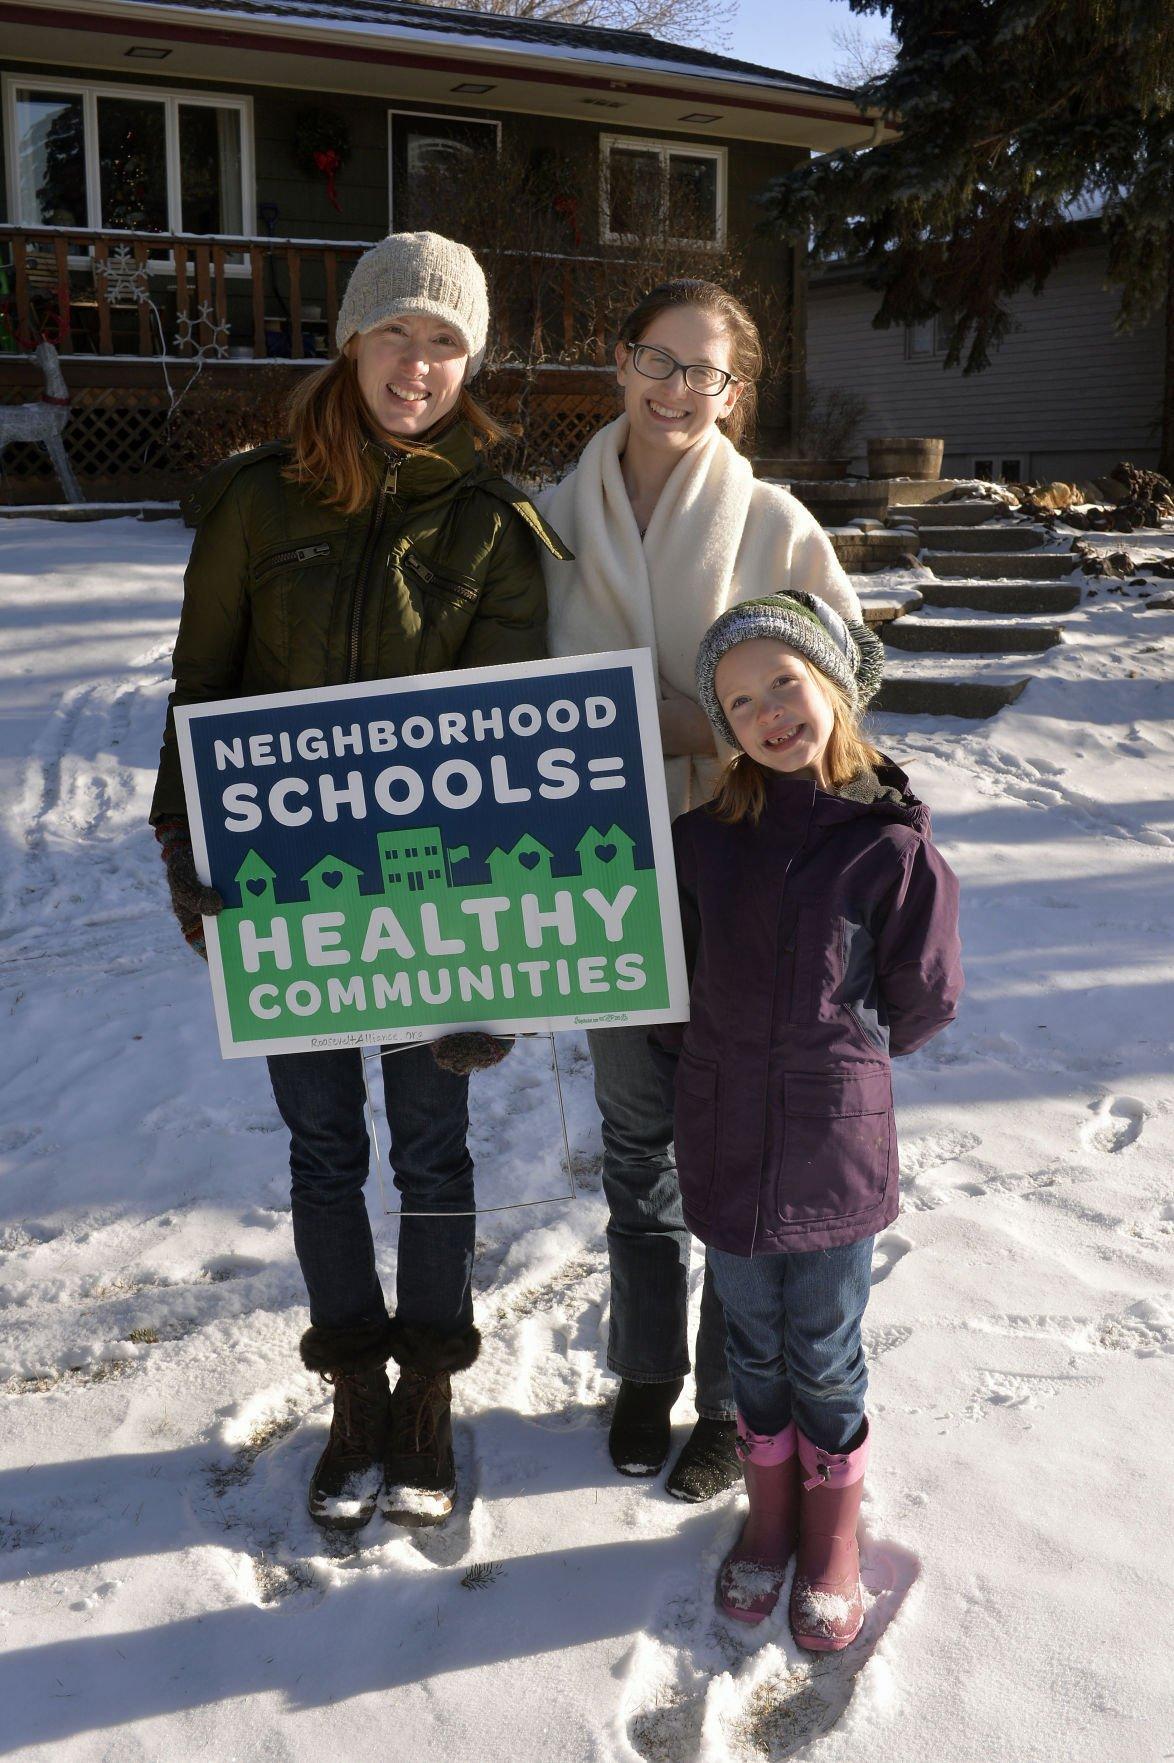 Neighborhood school campaign